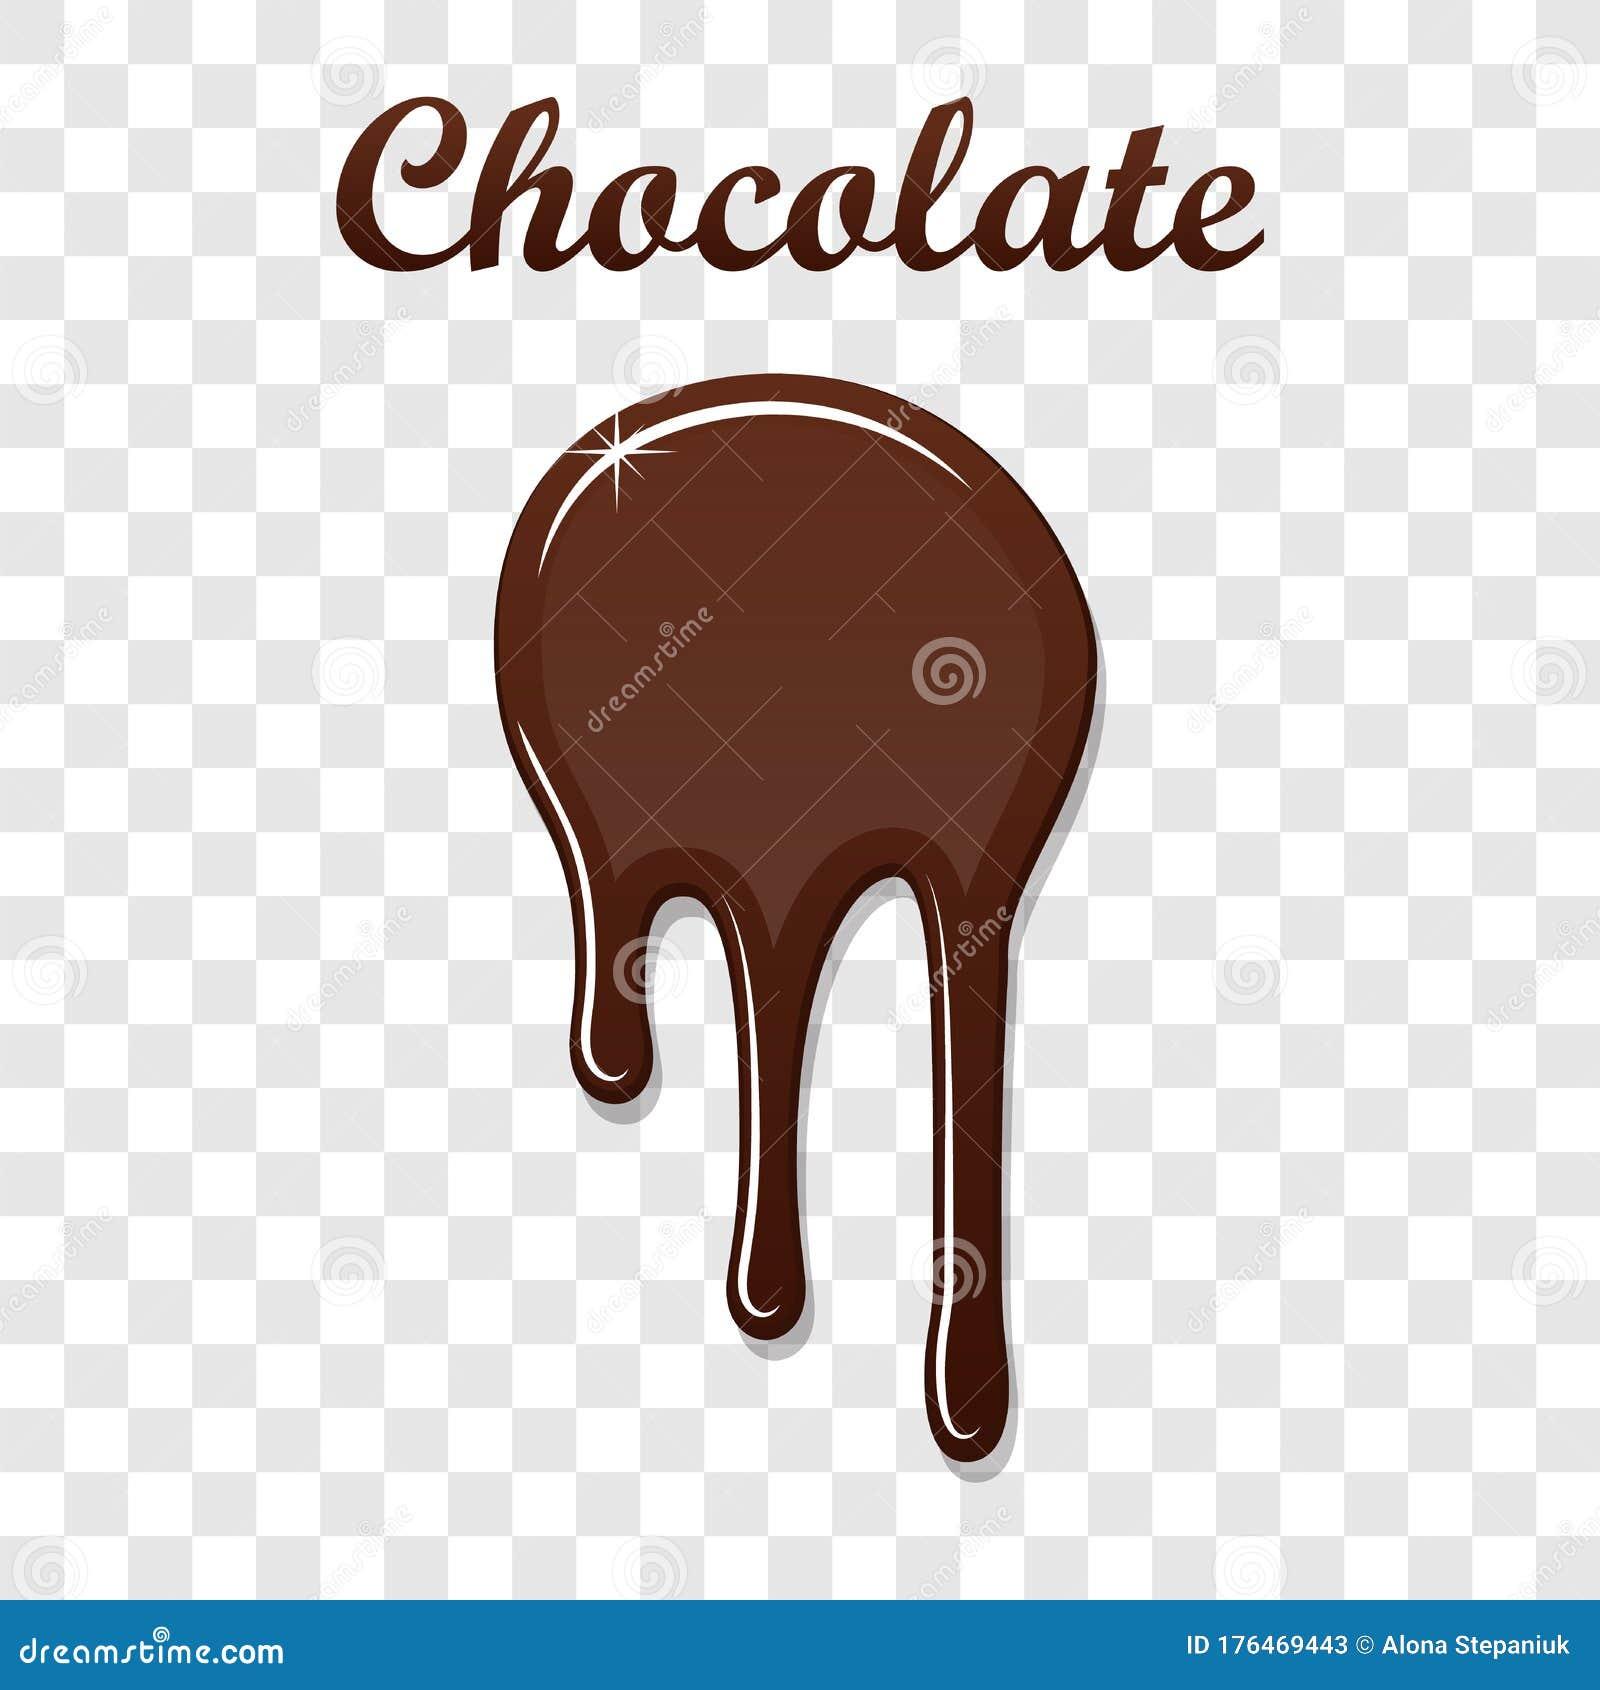 chocolate splash transparent background stock illustrations 644 chocolate splash transparent background stock illustrations vectors clipart dreamstime dreamstime com